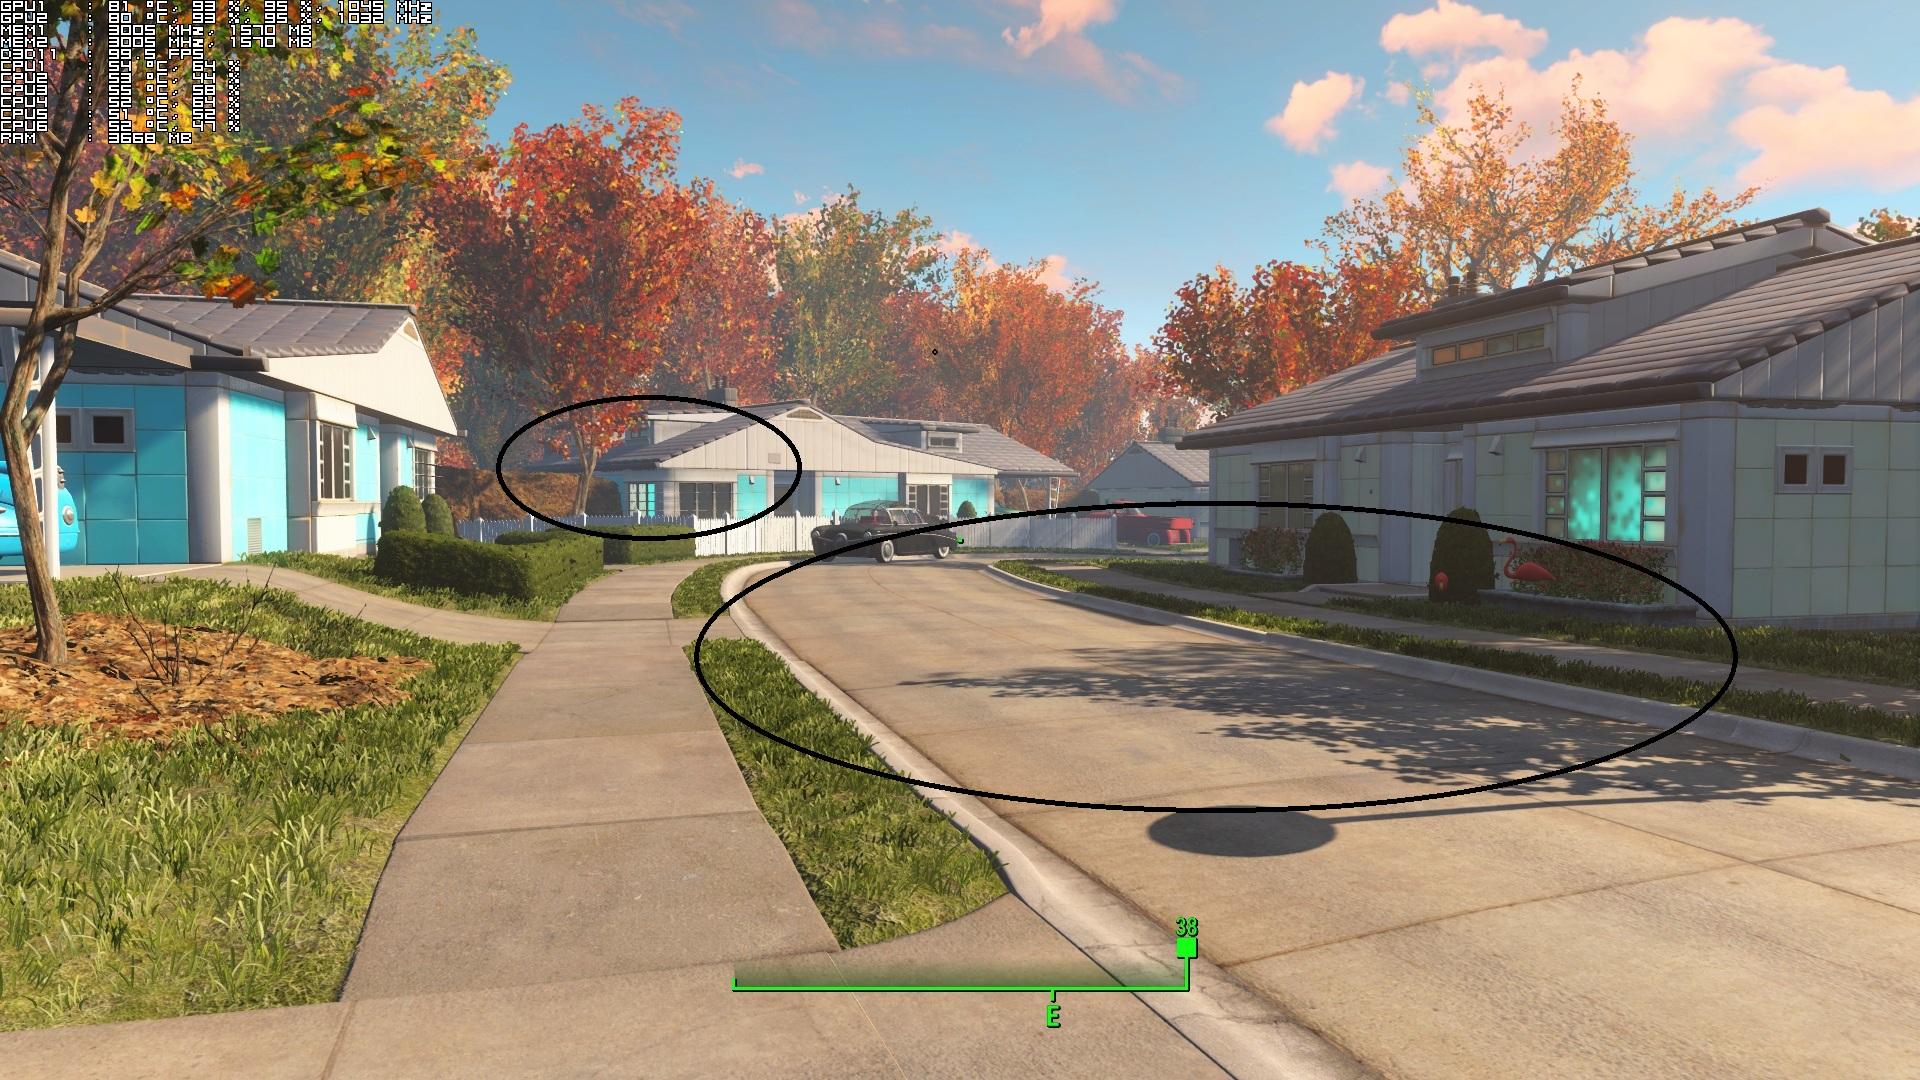 Fallout 4 shadows fading